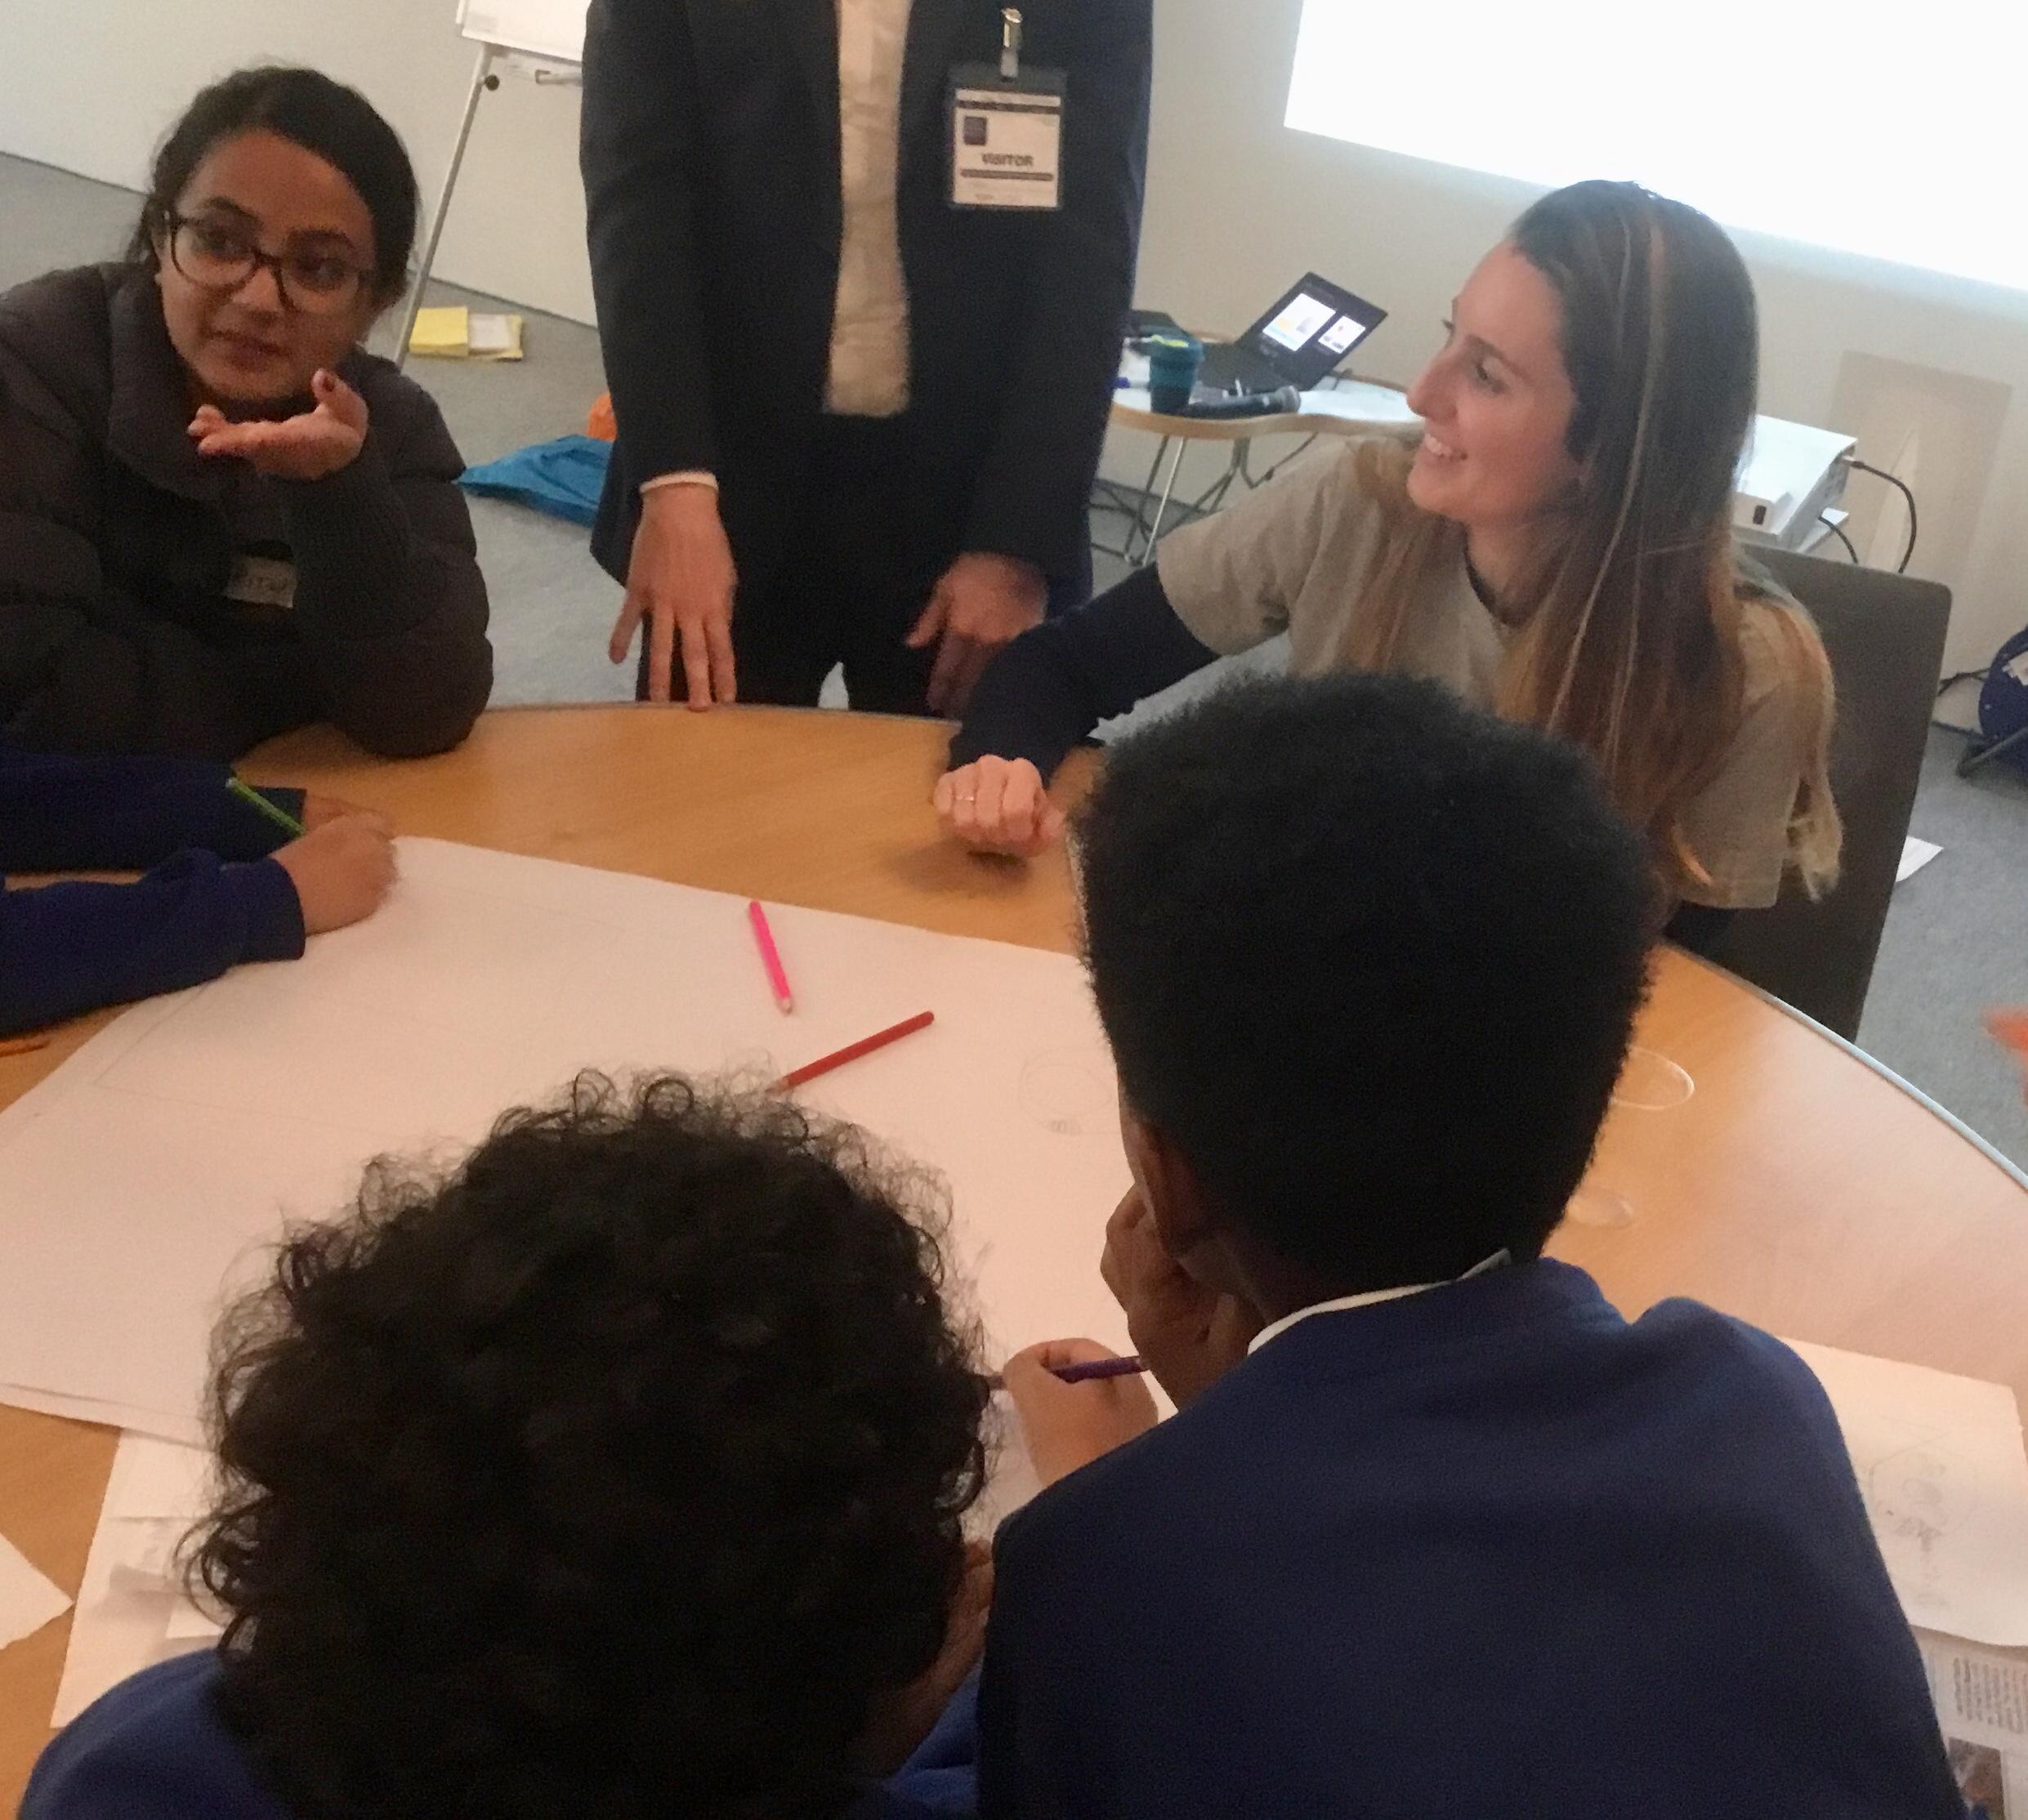 Laurel Lane @ London Business School